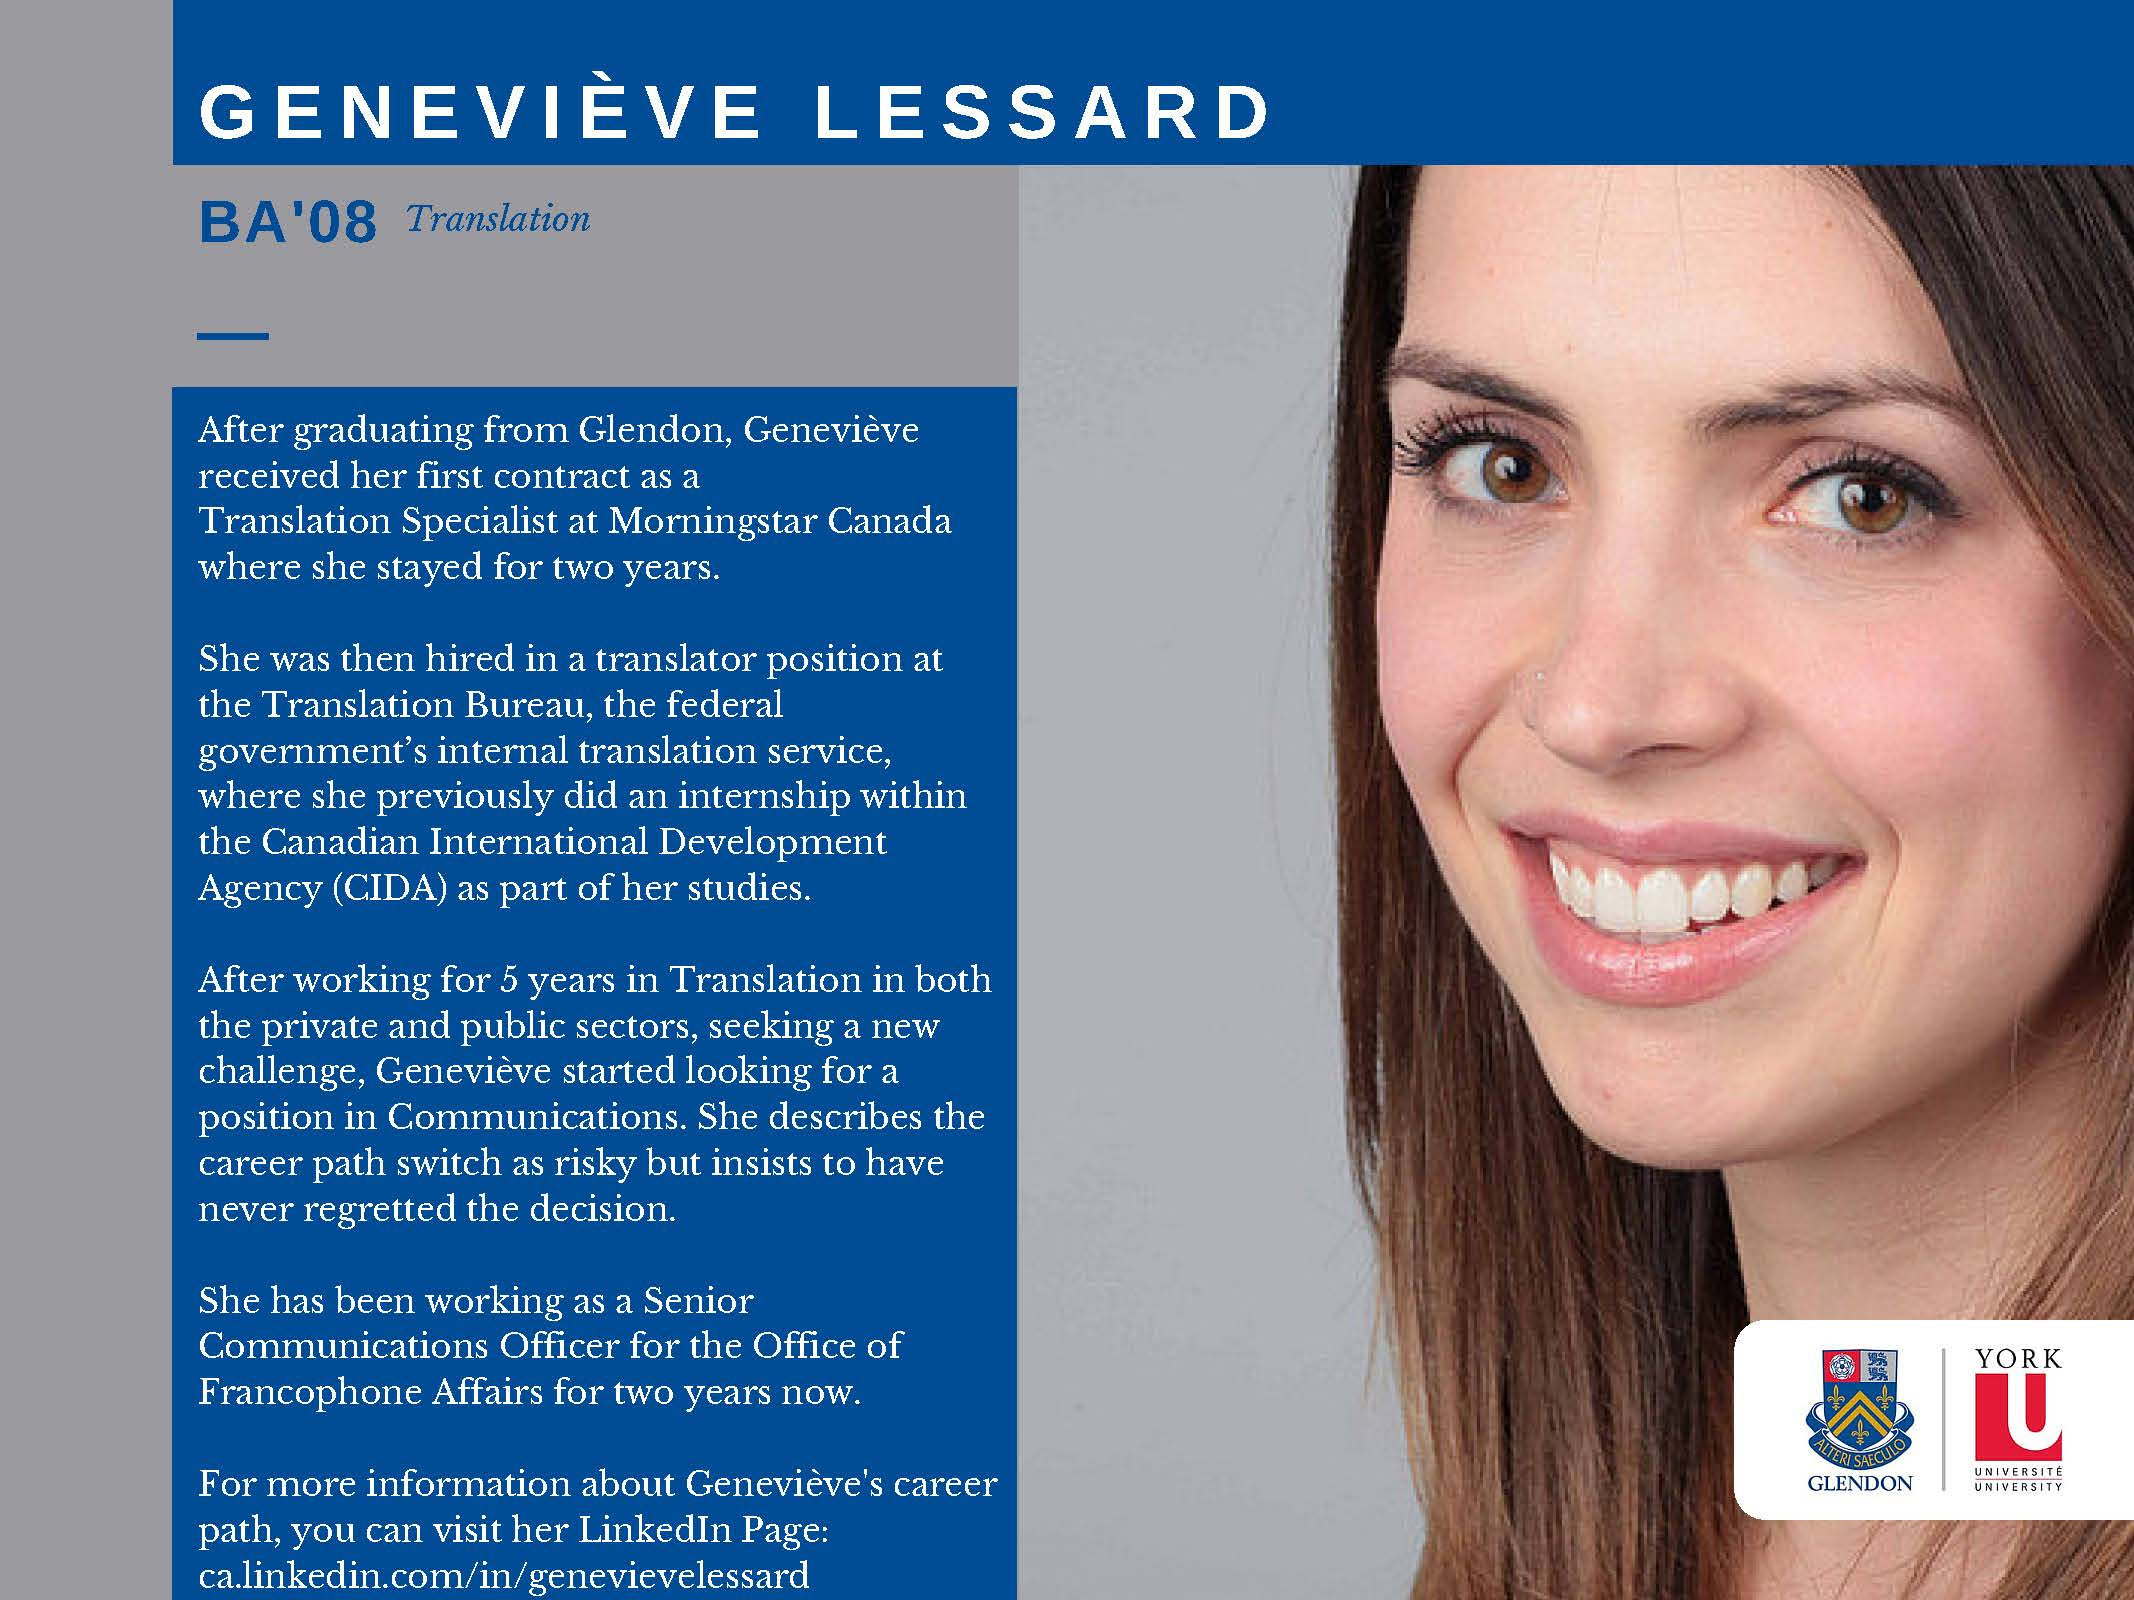 Genevieve Lessard